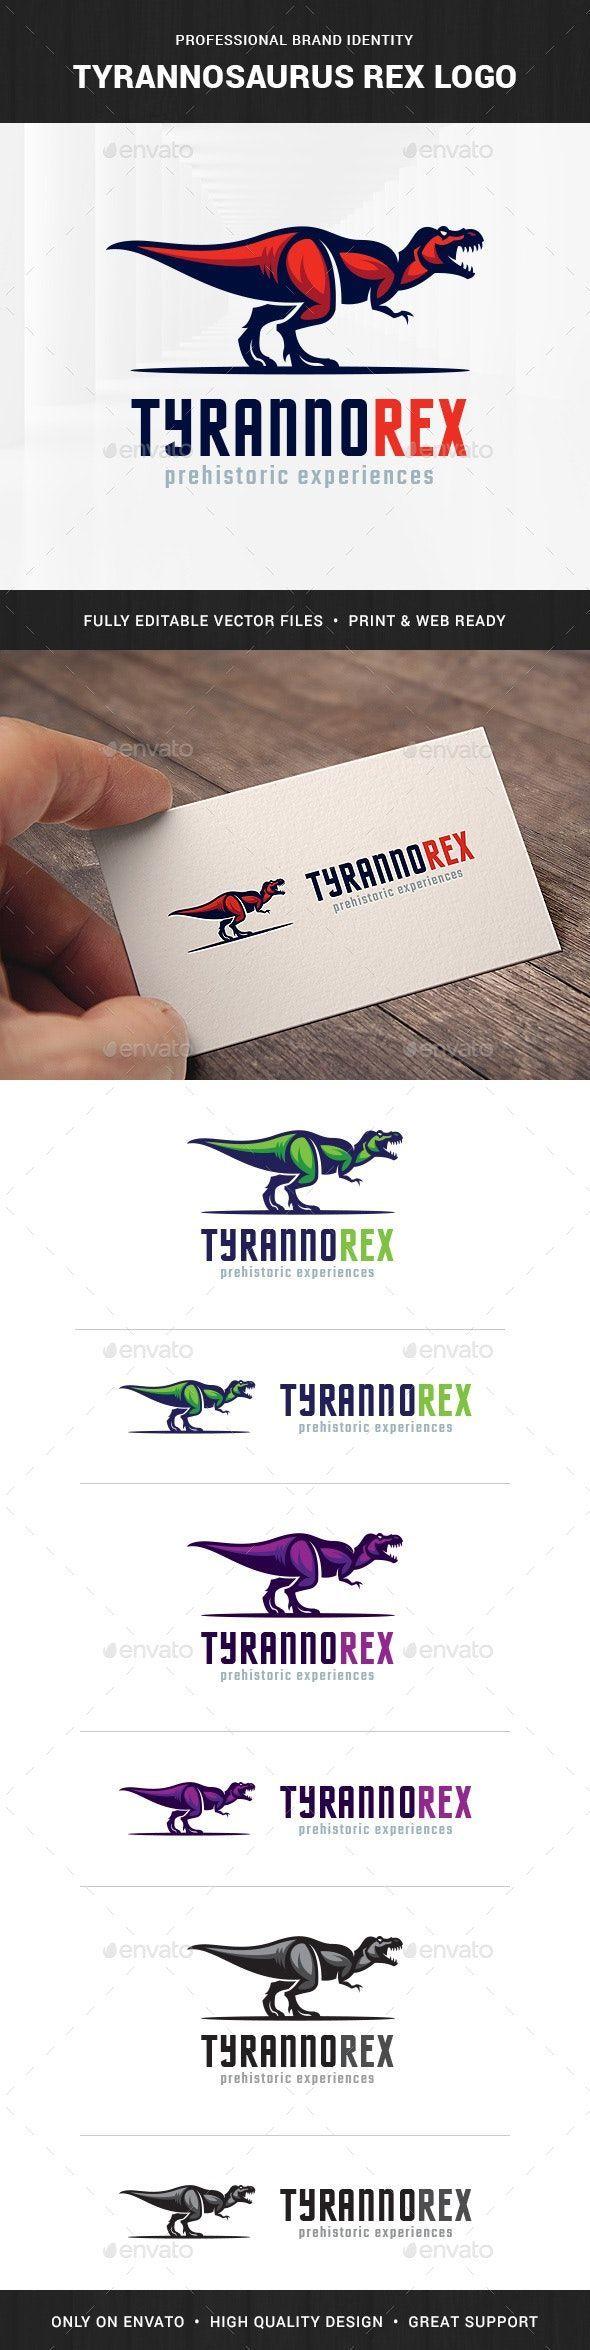 Tyrannosaurus Rex Logo Template #AD #Rex, #AFFILIATE, #Tyrannosaurus, #Template, #Logo #tyrannosaurusrex Tyrannosaurus Rex Logo Template #AD #Rex, #AFFILIATE, #Tyrannosaurus, #Template, #Logo #tyrannosaurusrex